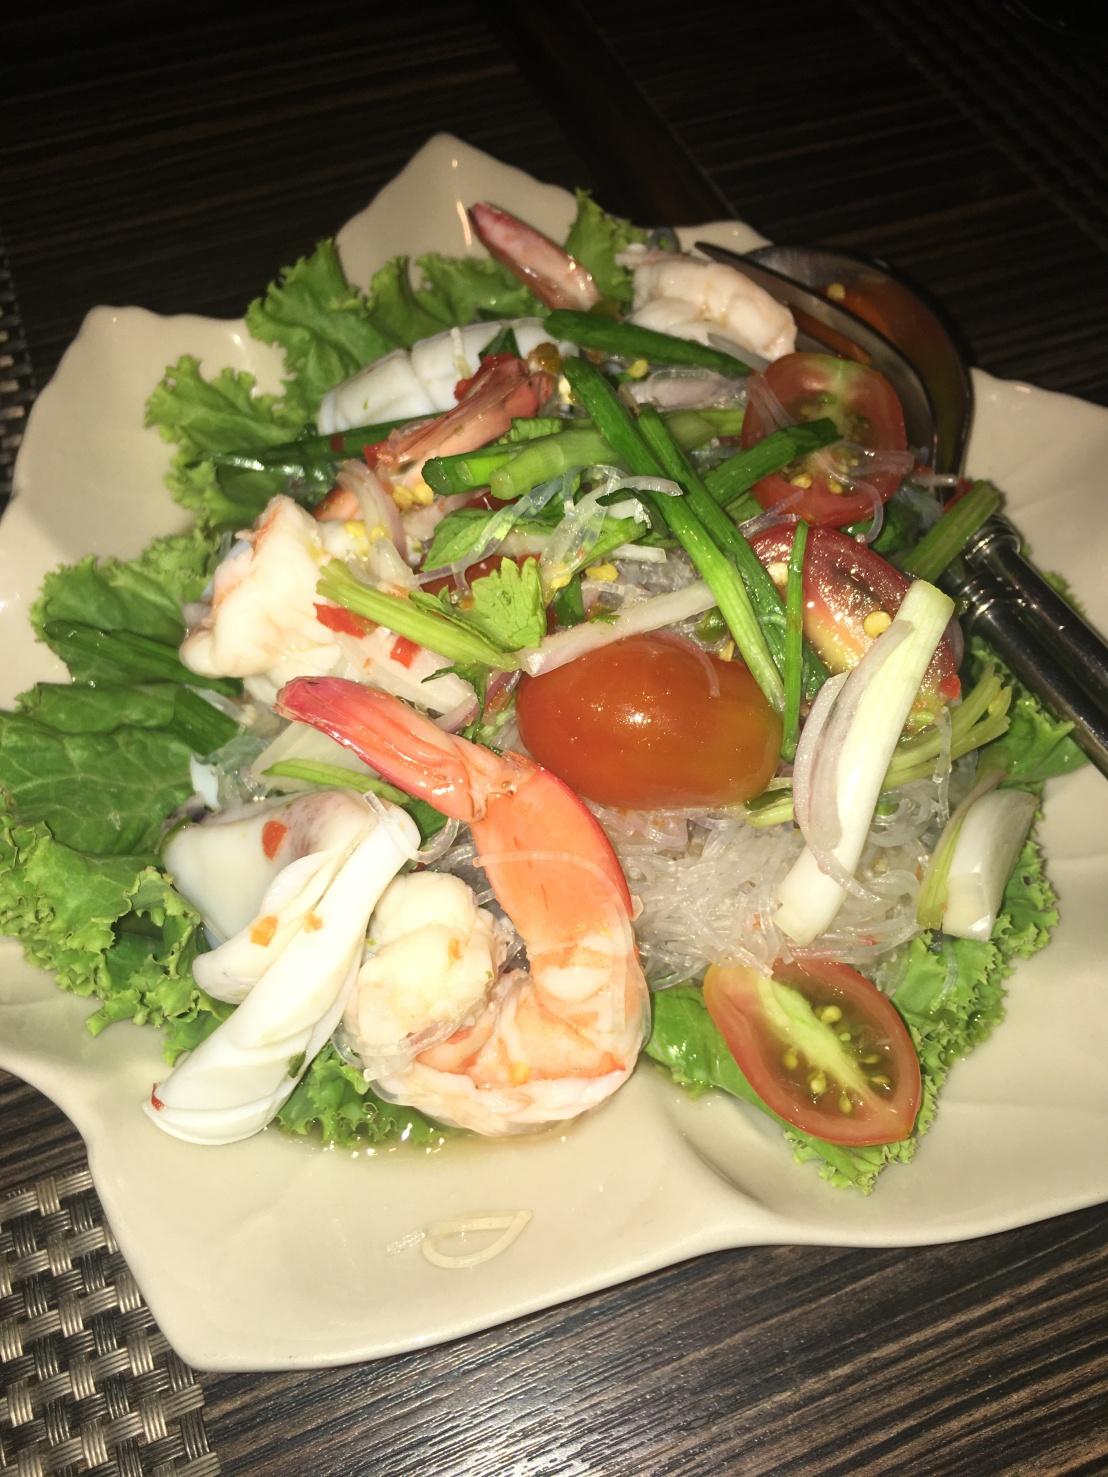 Day 1 - Bangkok - Dinner @ Ruen Urai 4